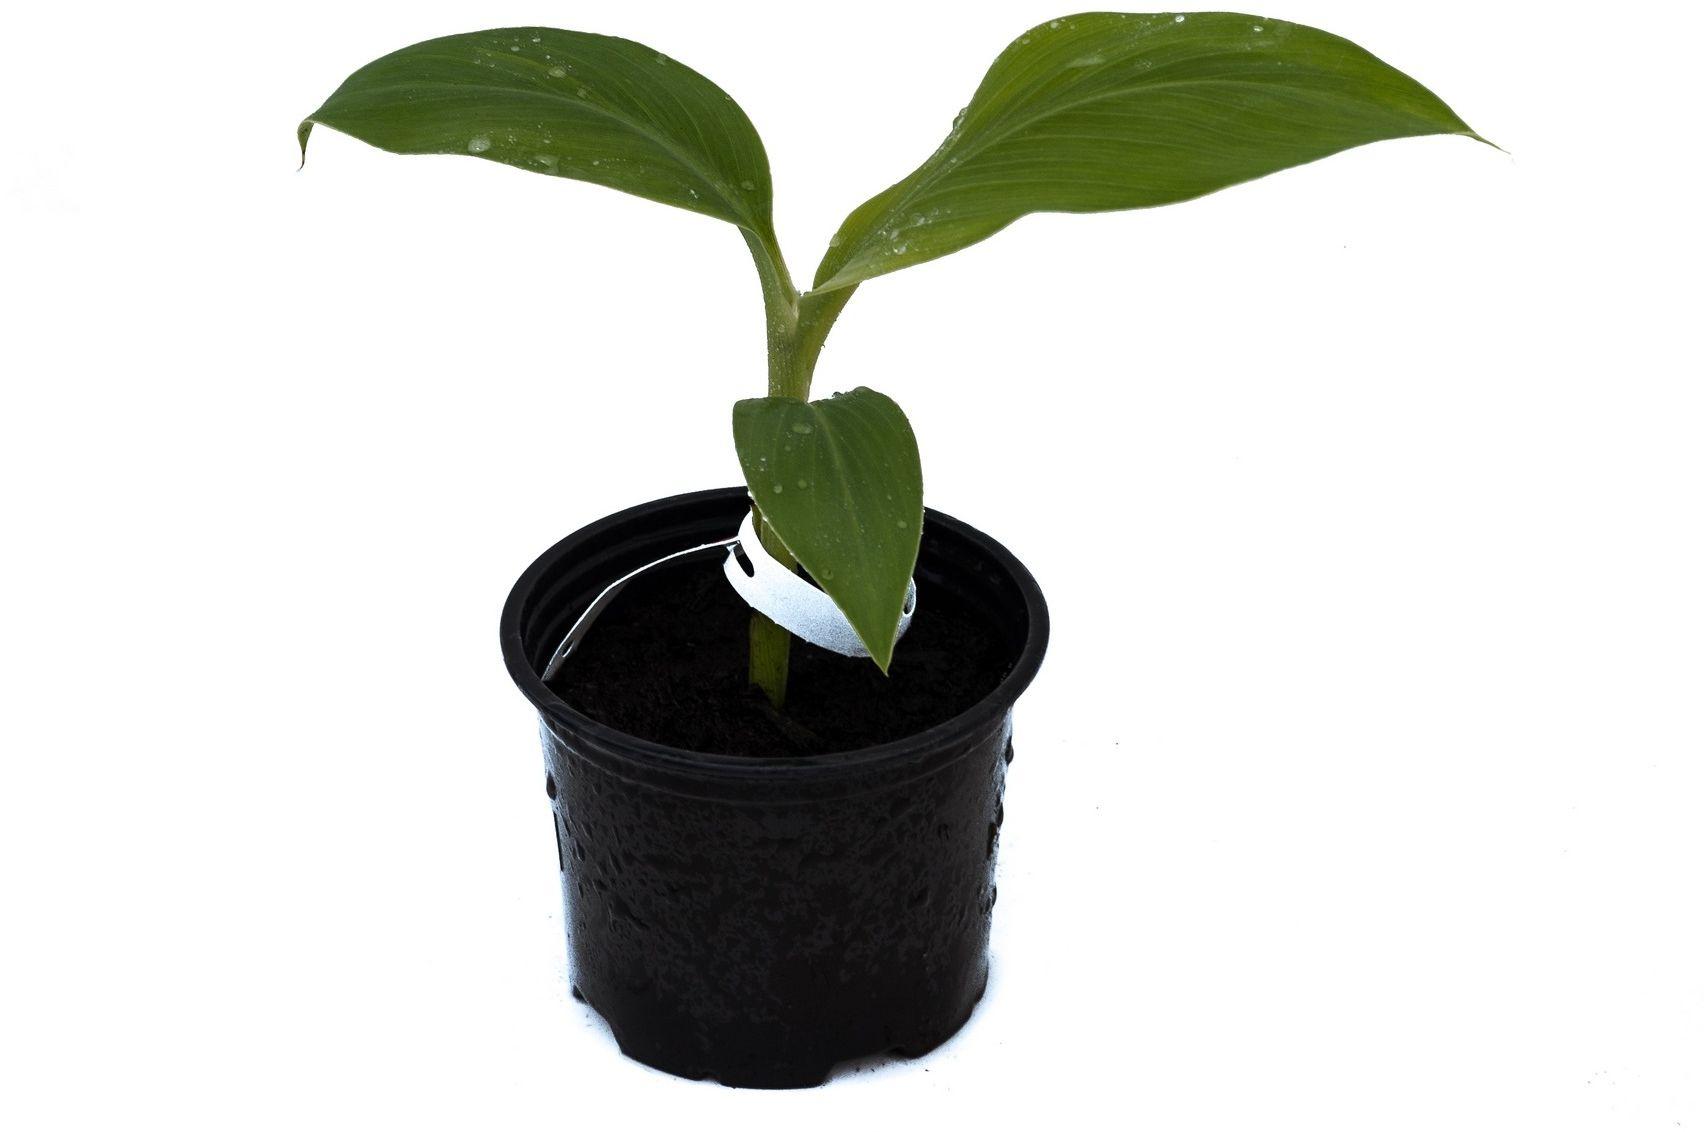 Bananowiec musa acuminata var. acuminata sadzonka